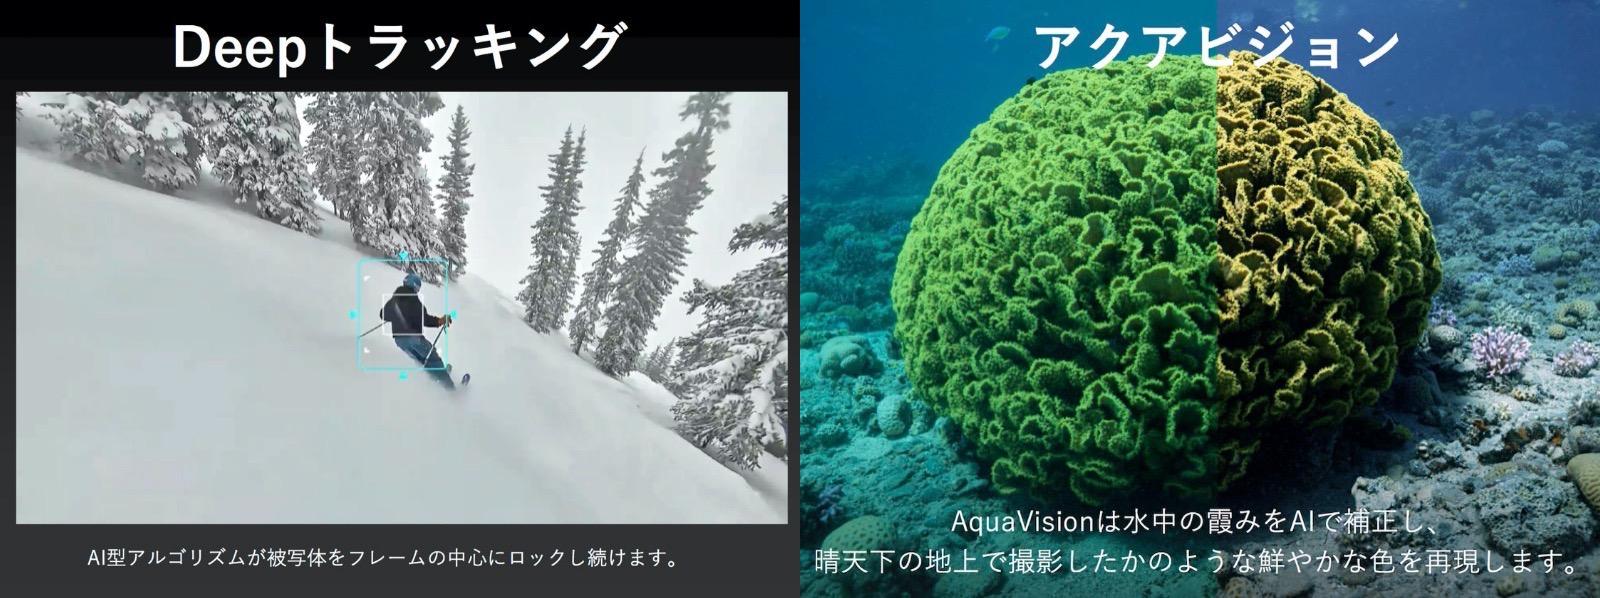 DeepTracking-and-AquaVision.jpg